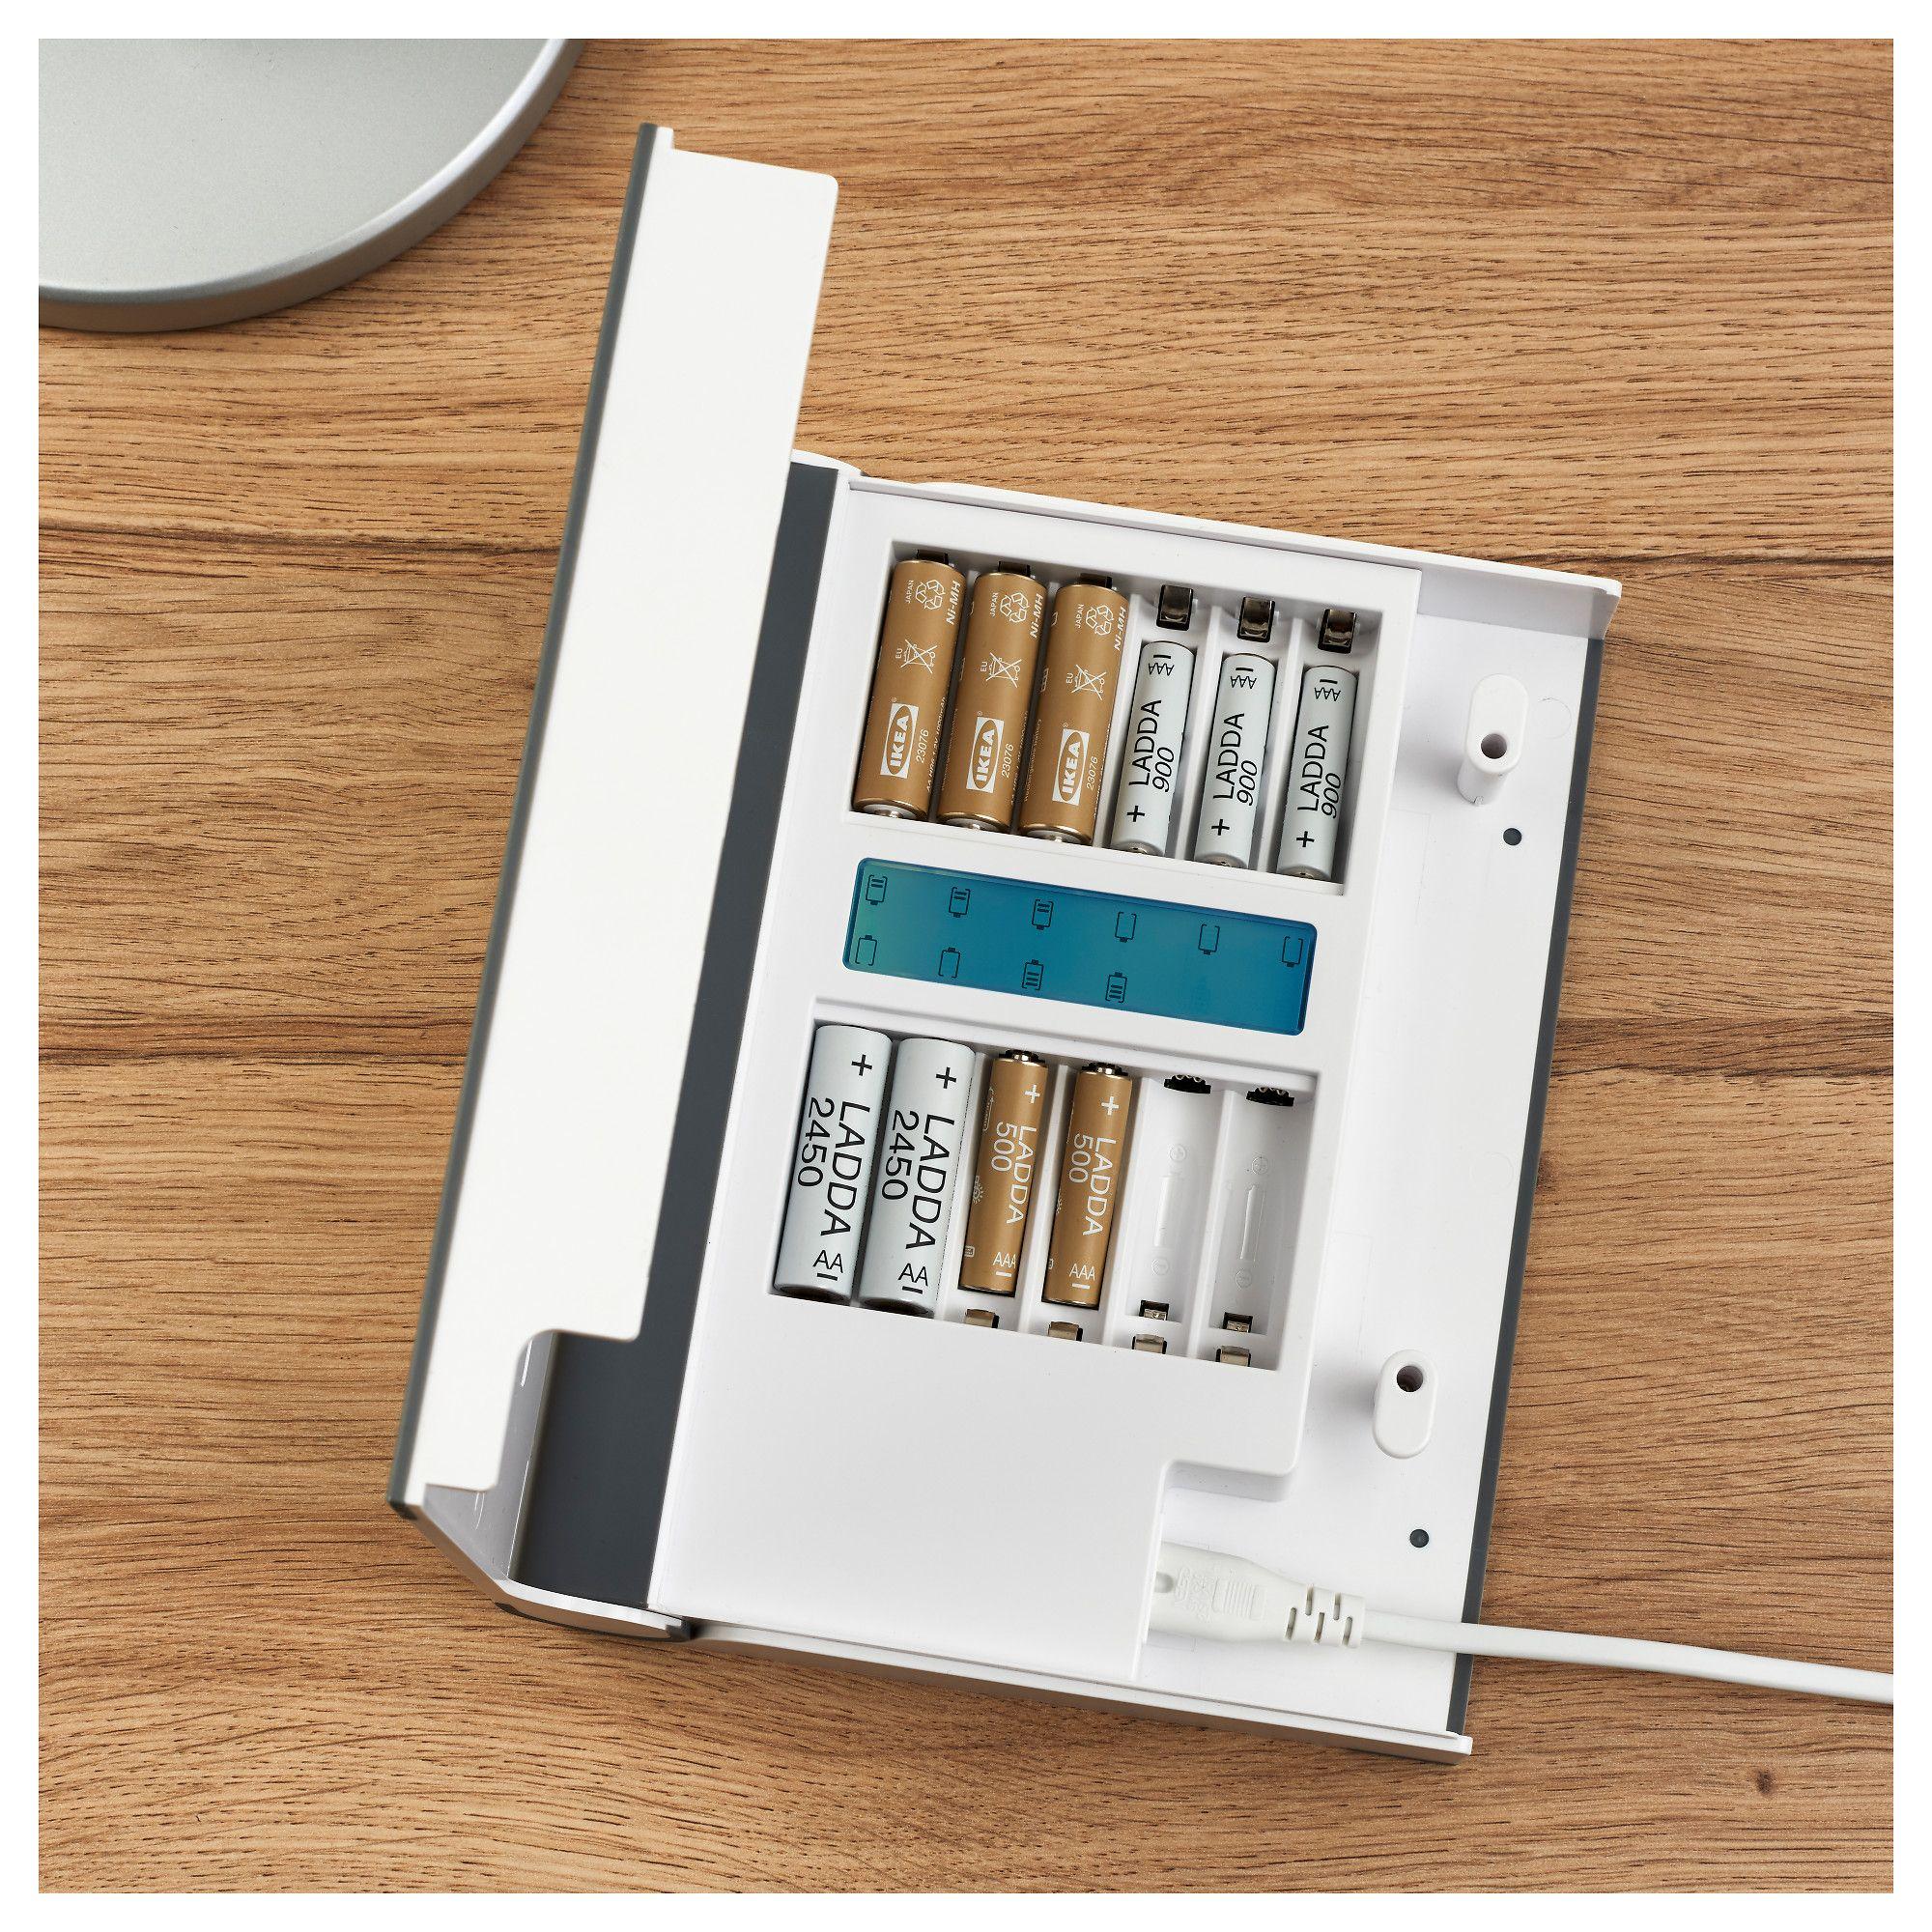 Home Furniture Store Modern Furnishings Decor At Home Furniture Store Cord Organization Wellness Design